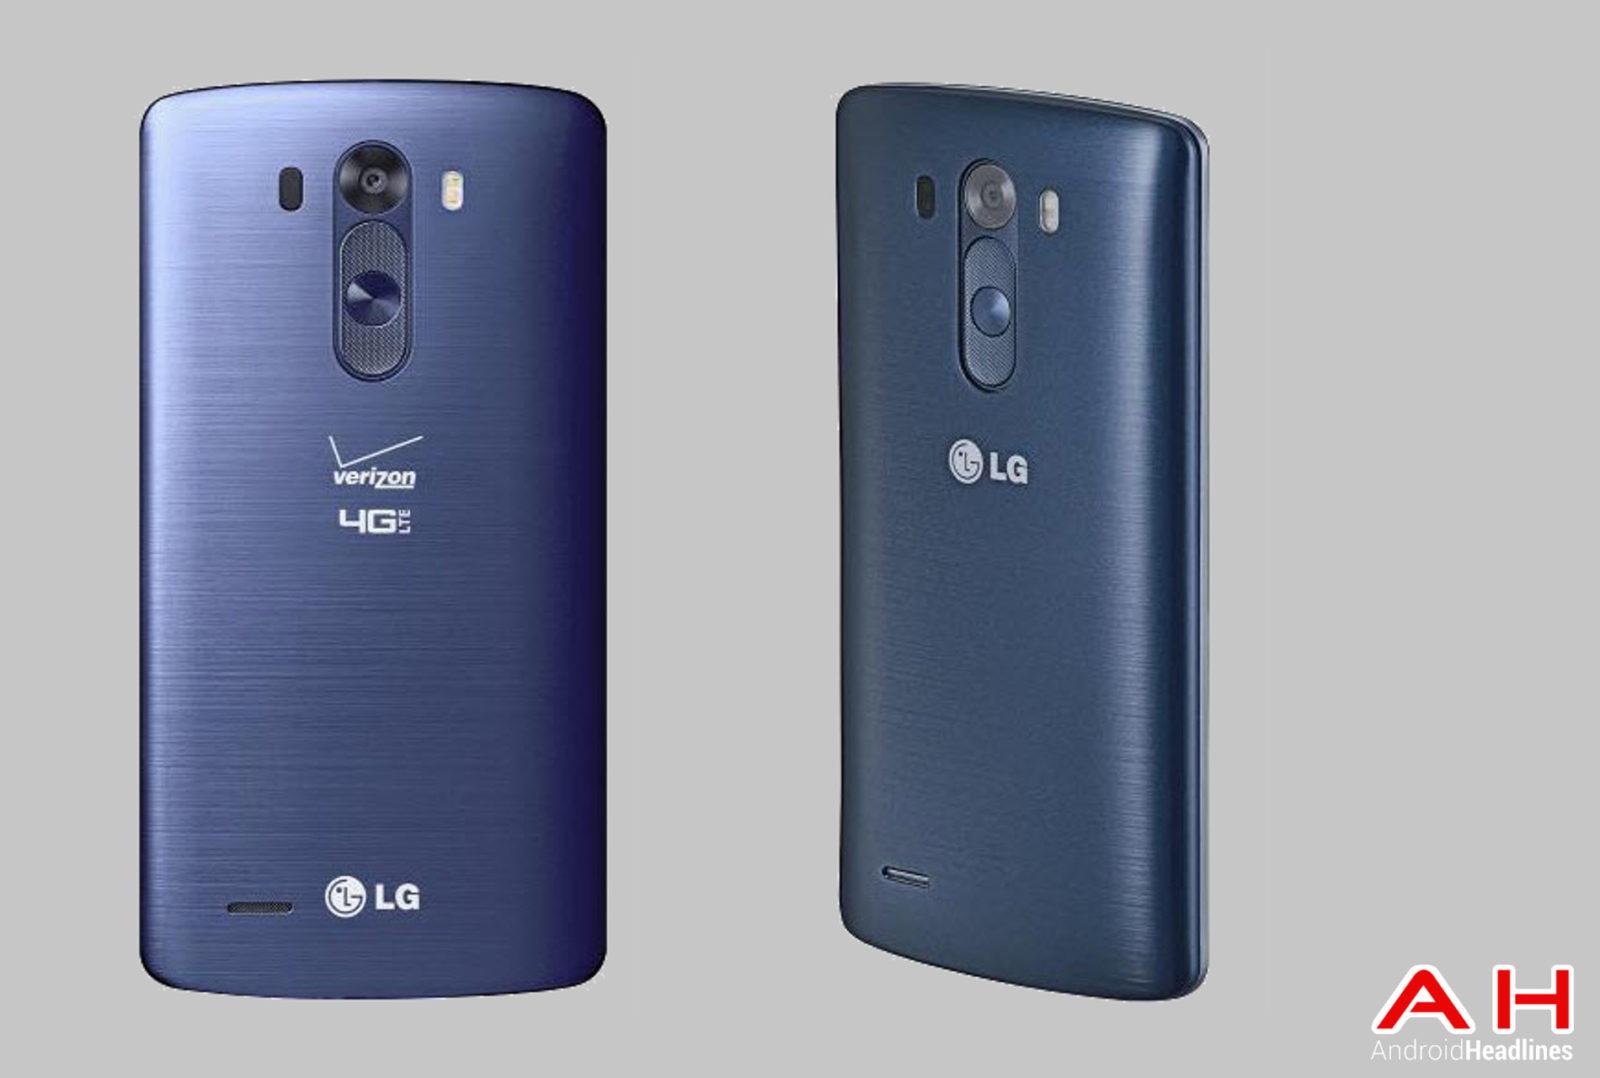 LG G3 Blue BackAngle View cam AH